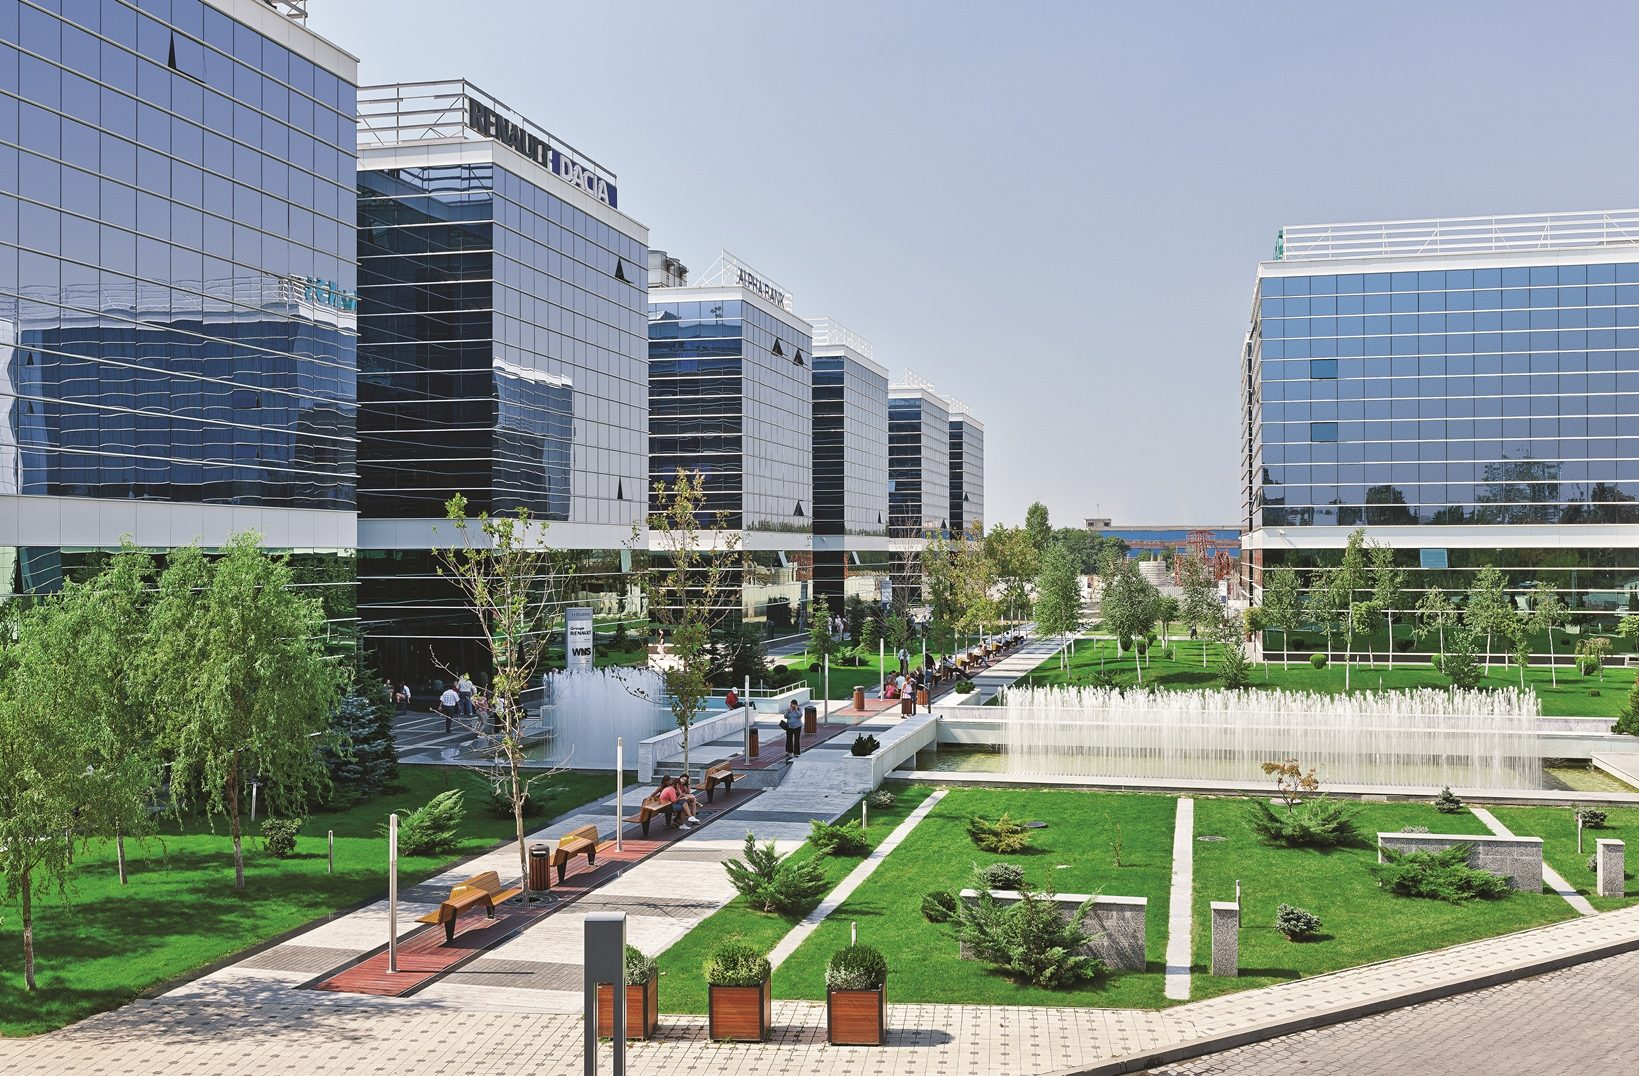 WFMC - West Gate Business Park Project - Romania